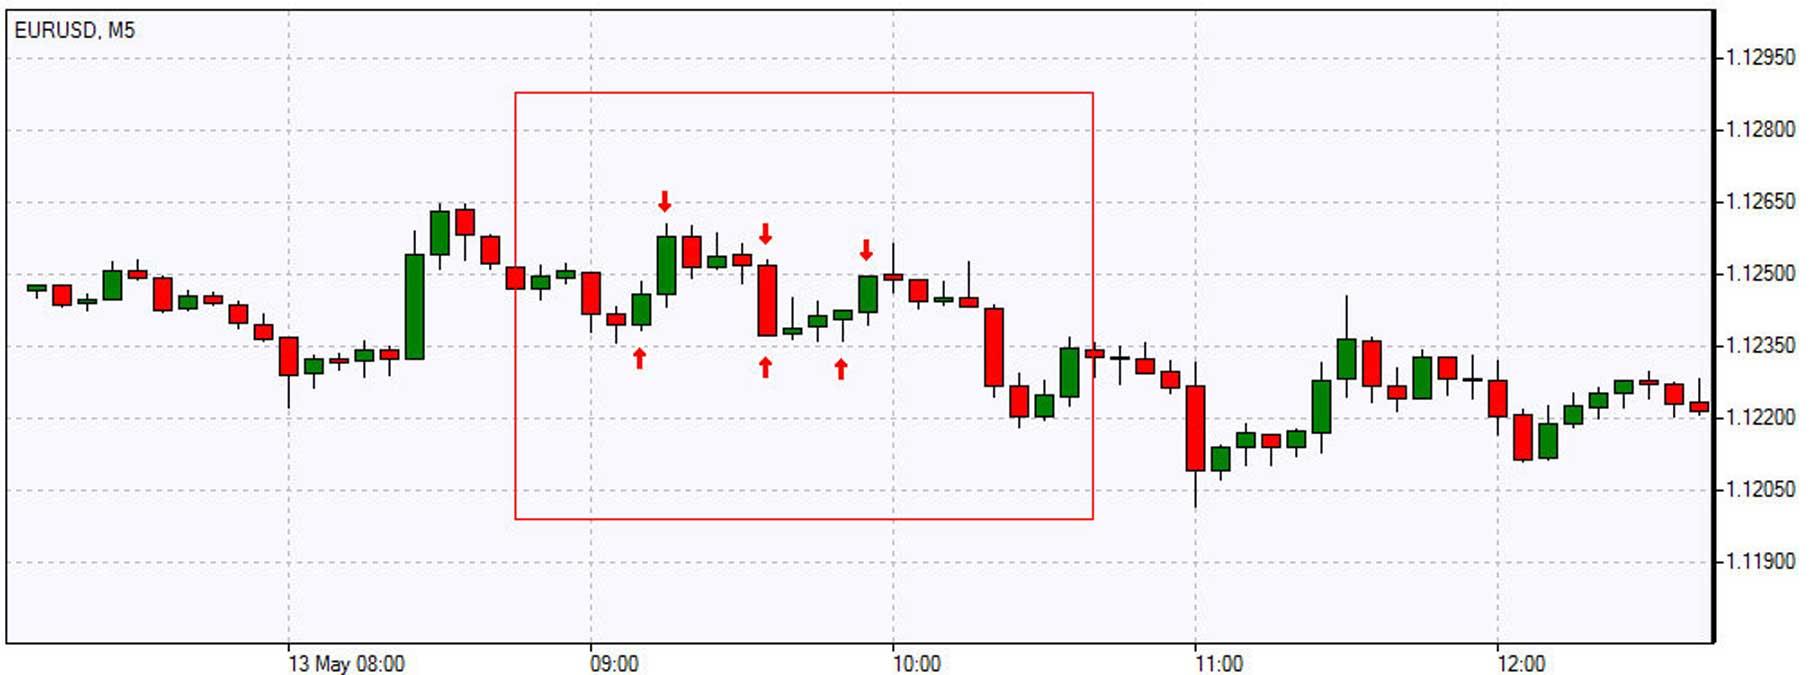 Securities trading strategies